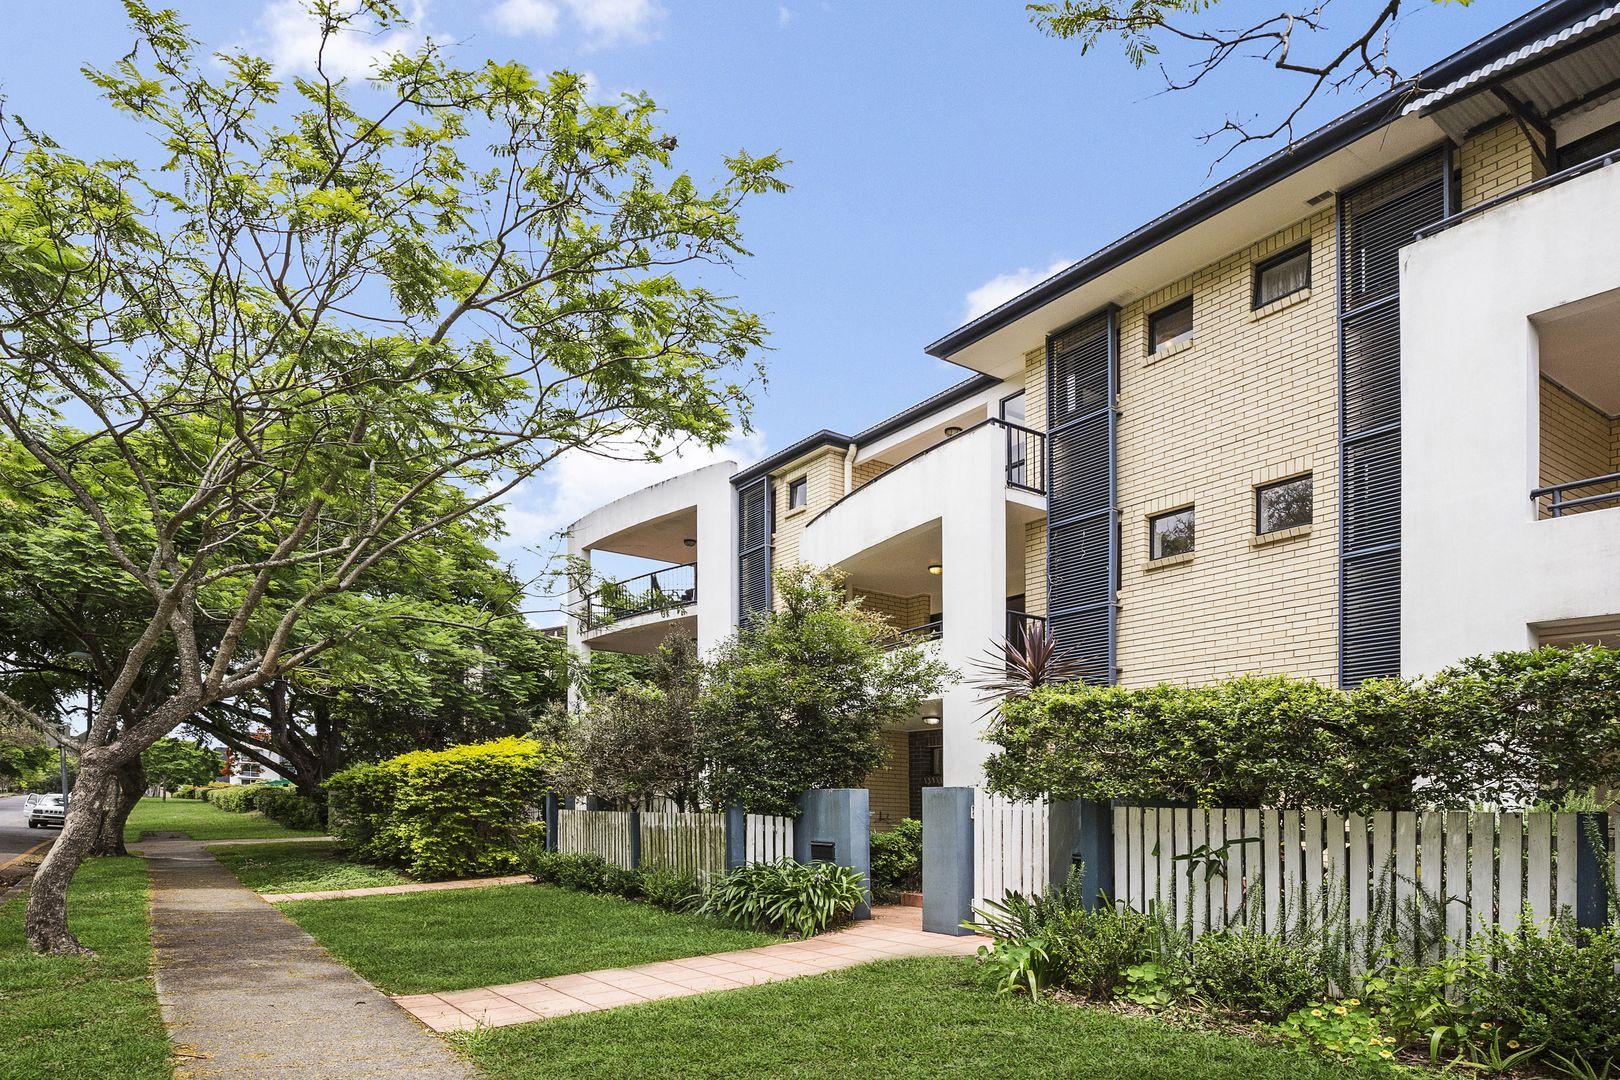 3/177 Macquarie Street, St Lucia QLD 4067, Image 1